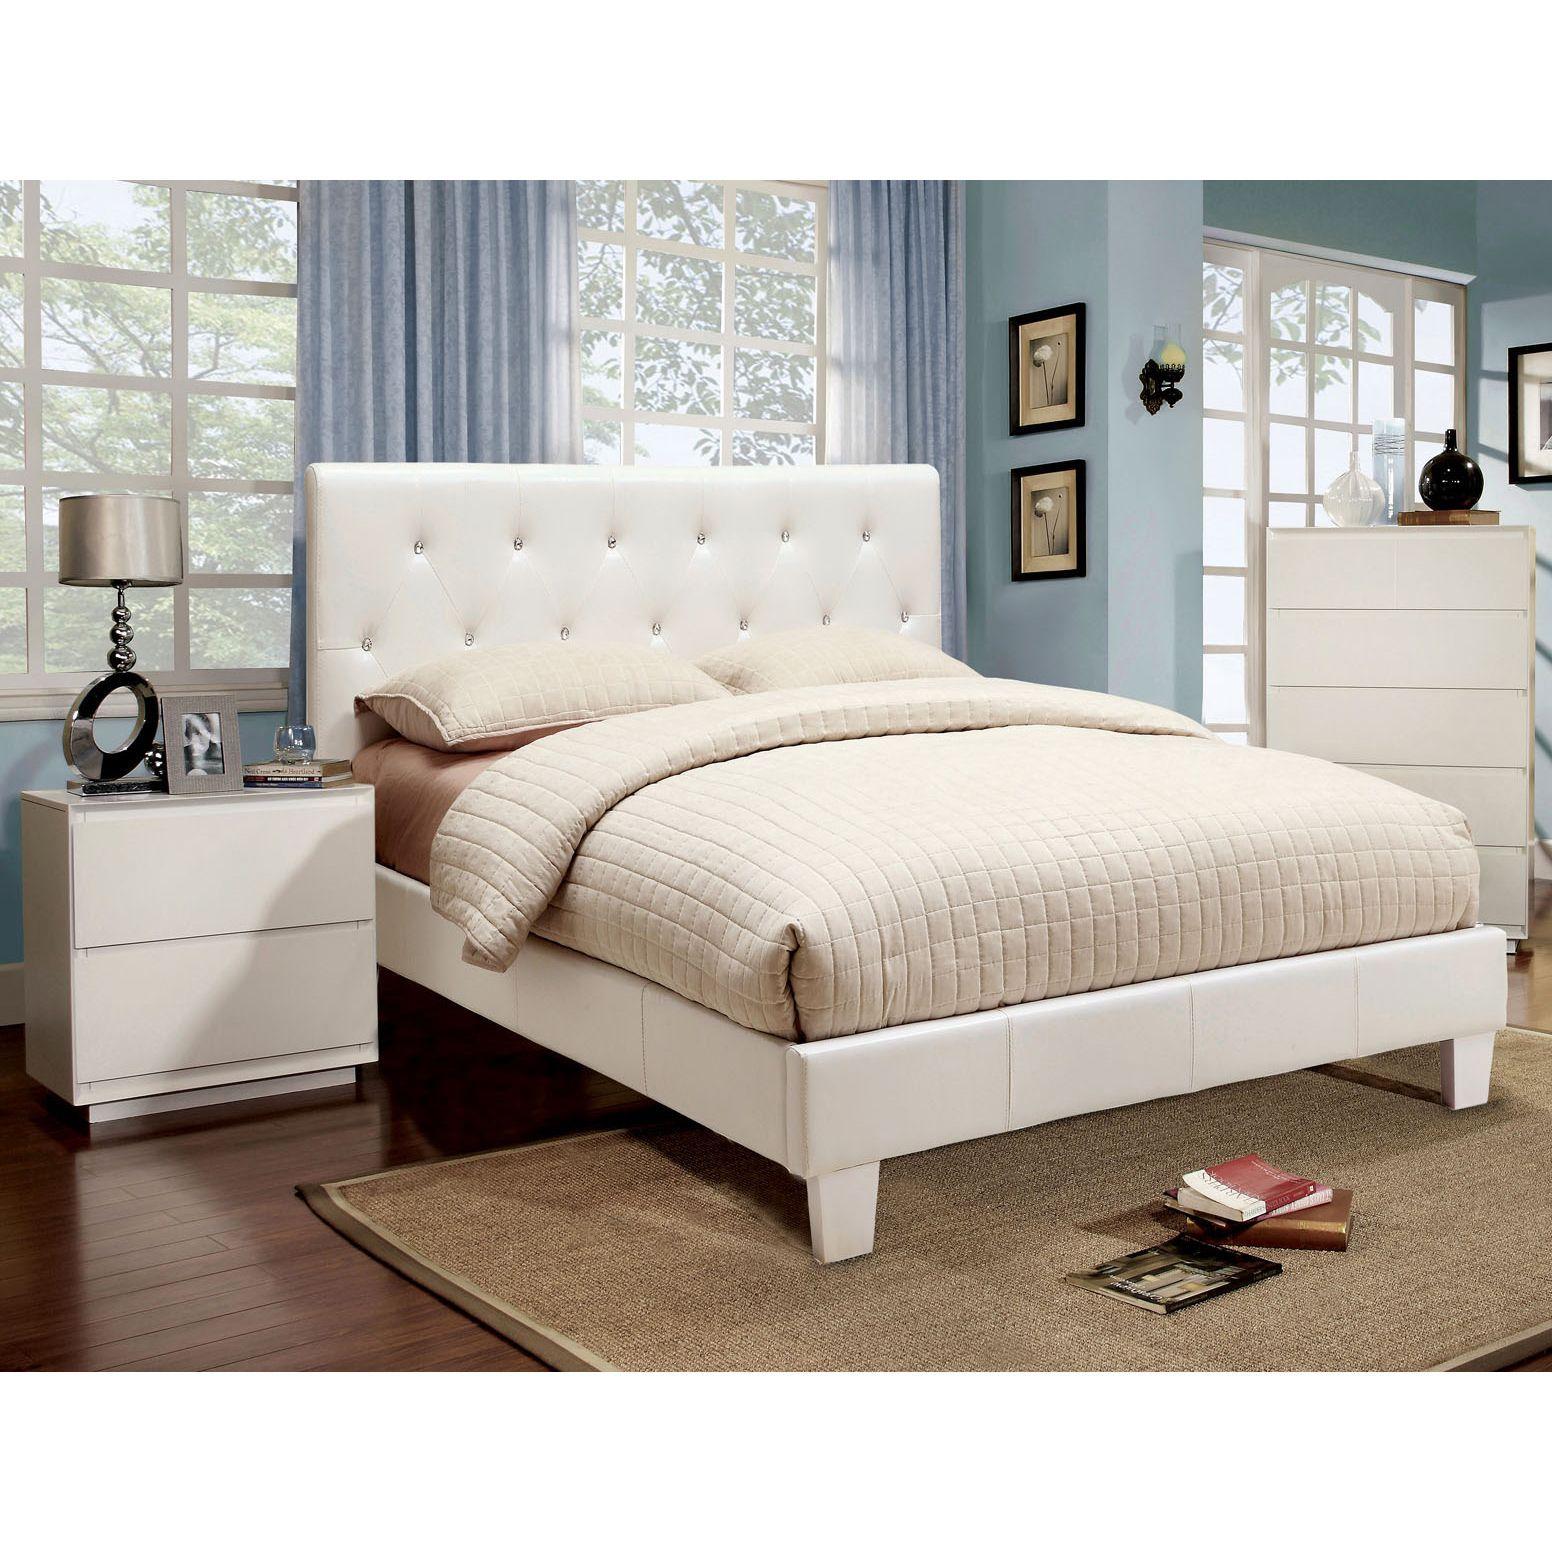 Furniture of America Mircella Tufted Leatherette Fullsize